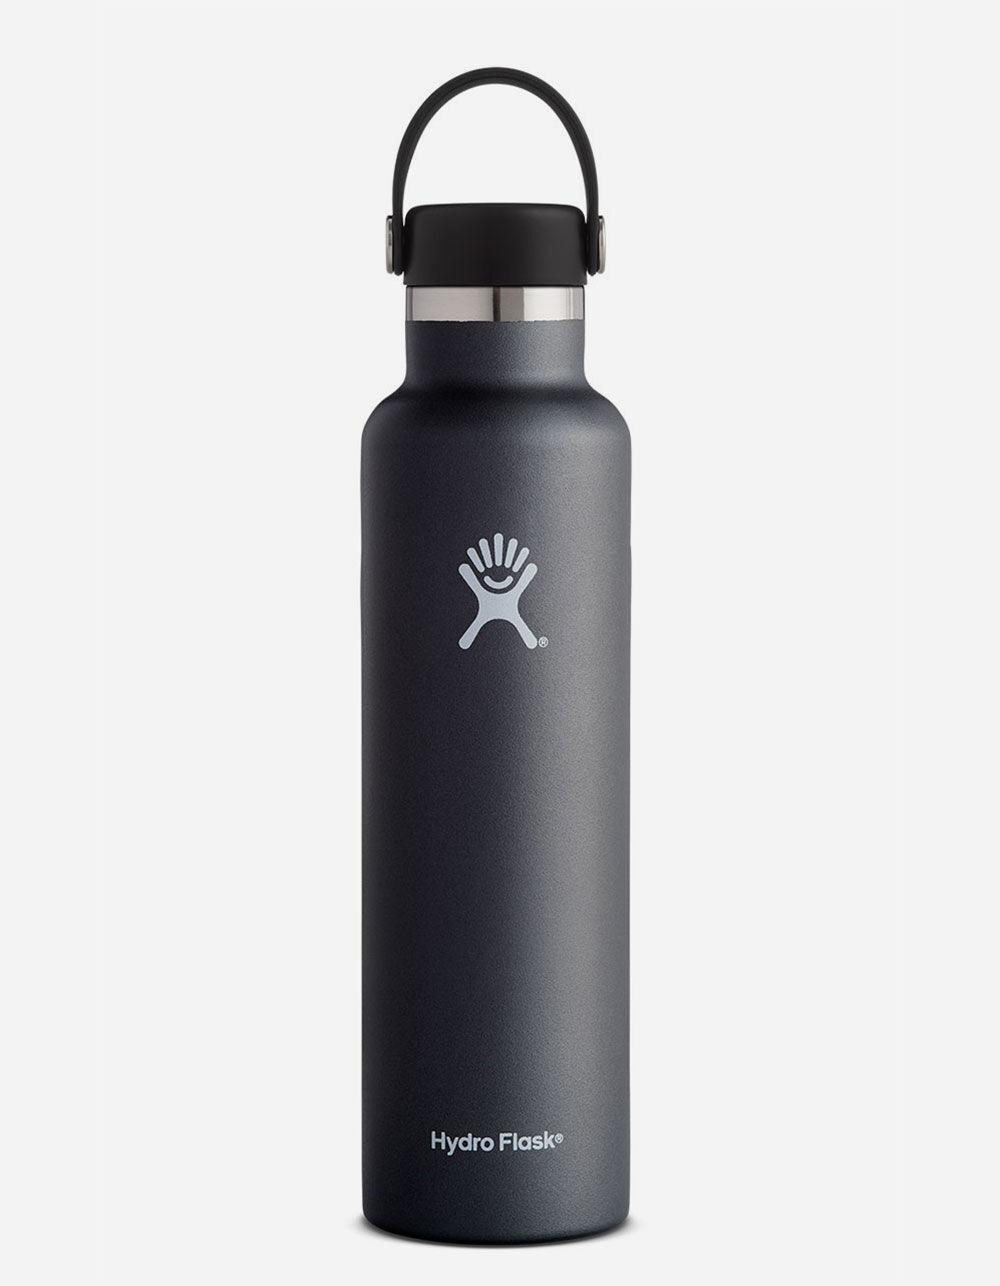 HYDRO FLASK Black 24oz Standard Mouth Water Bottle